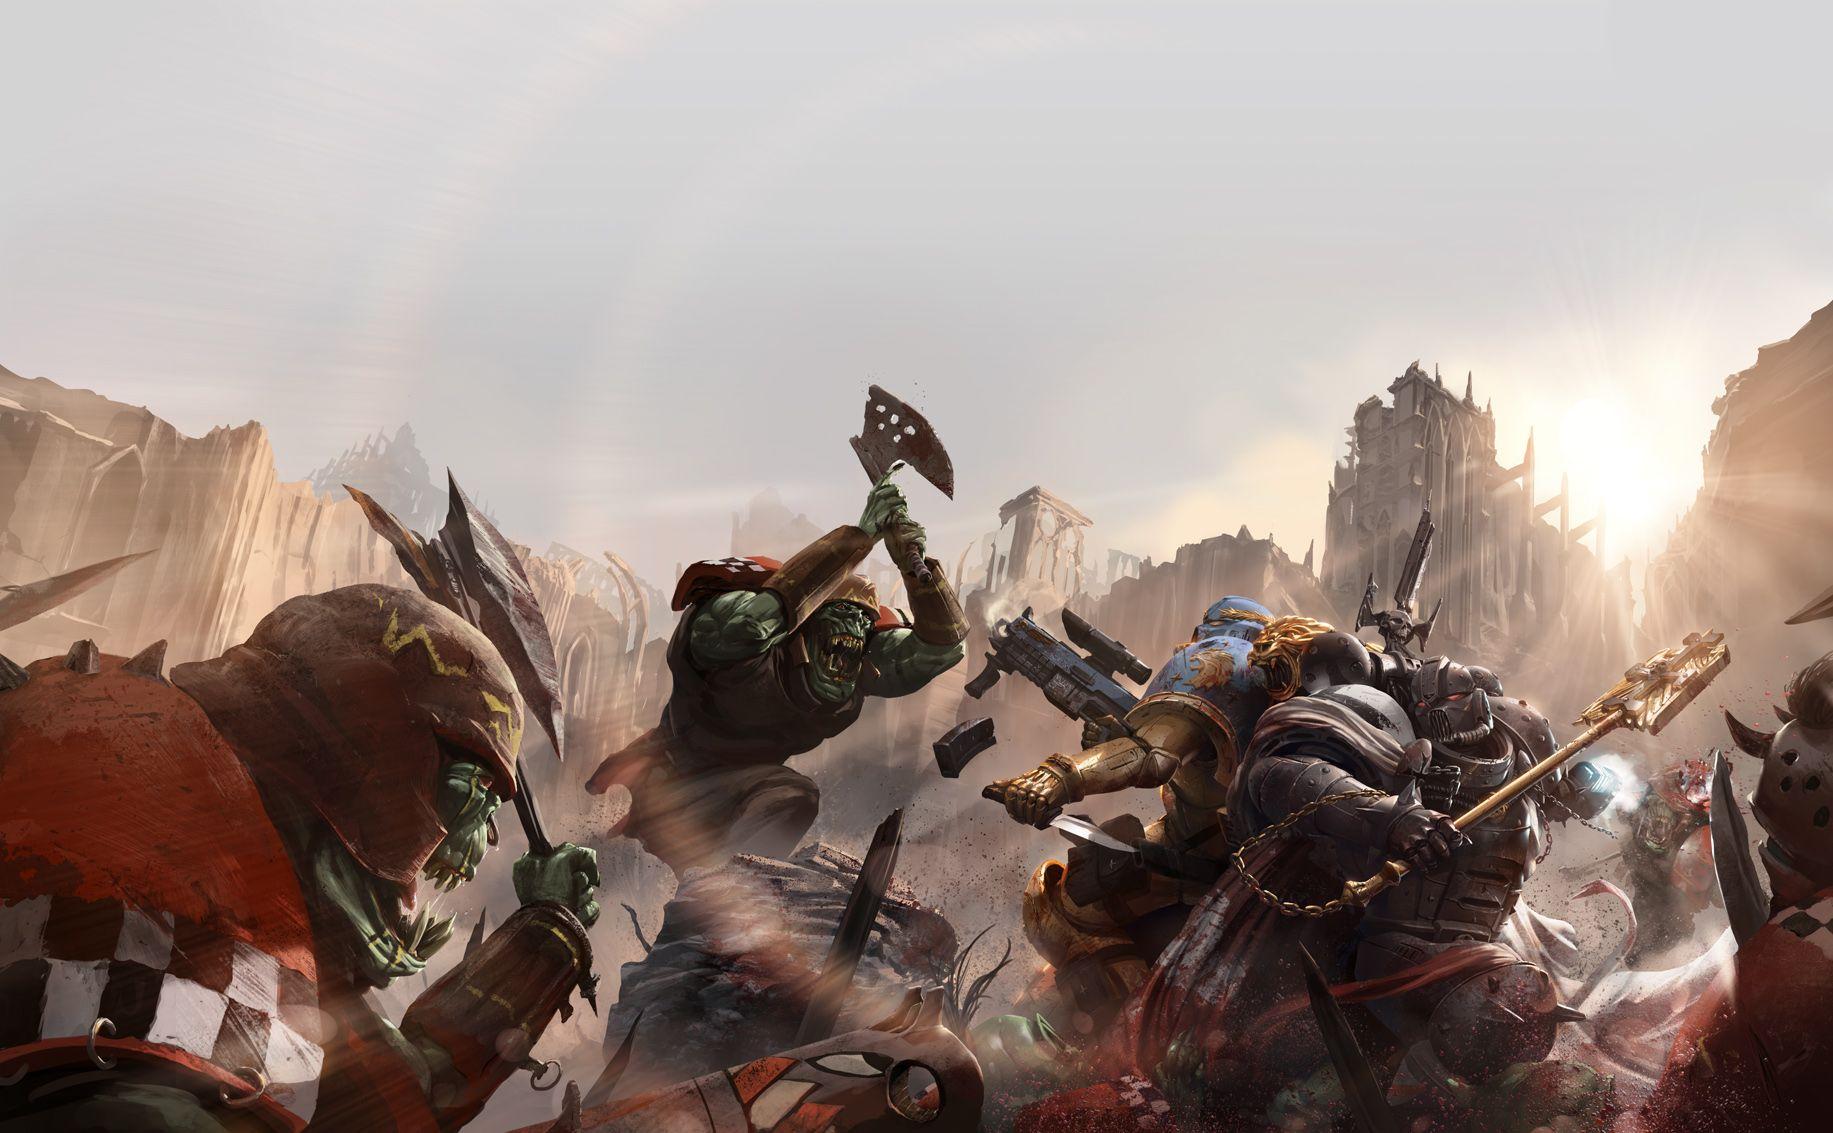 Warhammer 40k death company wallpaper - Space Marines Vs Orks Wallpaper Warhammer Fantasywarhammer 40kwarhammer